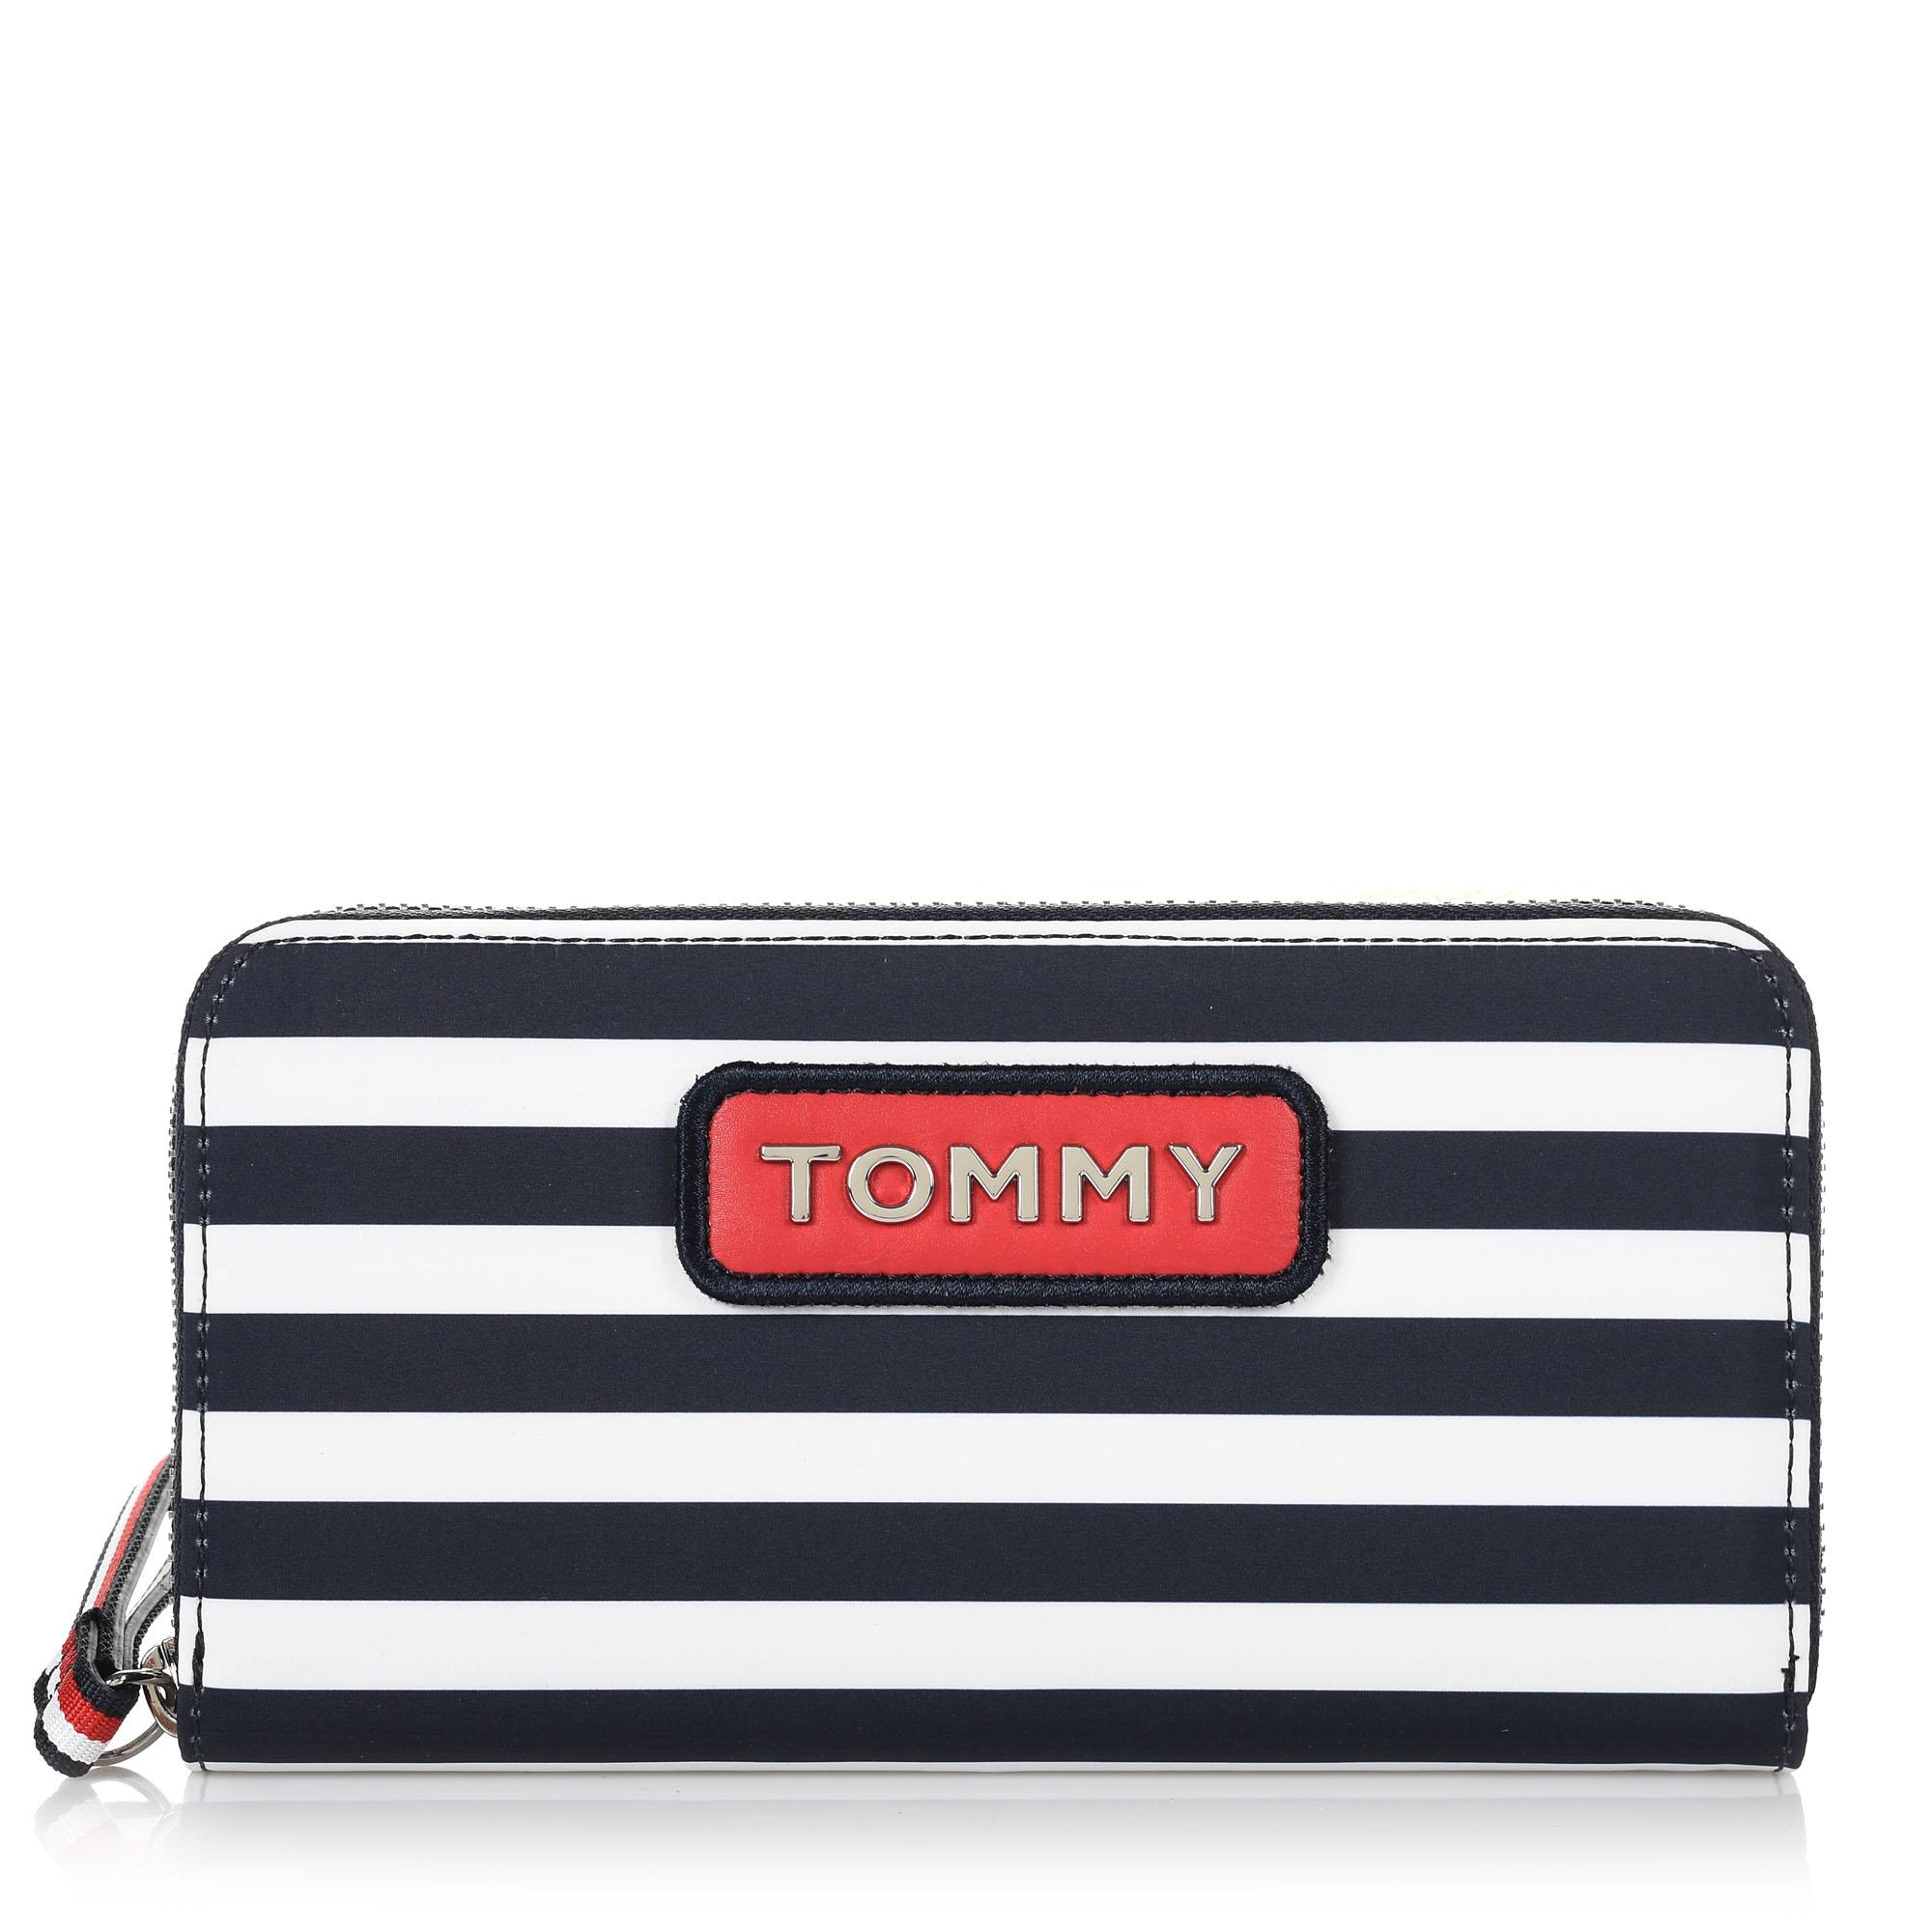 a4e0428cae Πορτοφόλι Κασετίνα Tommy Hilfiger Varsity Nylon LRG ZA Stripe AW0AW06268